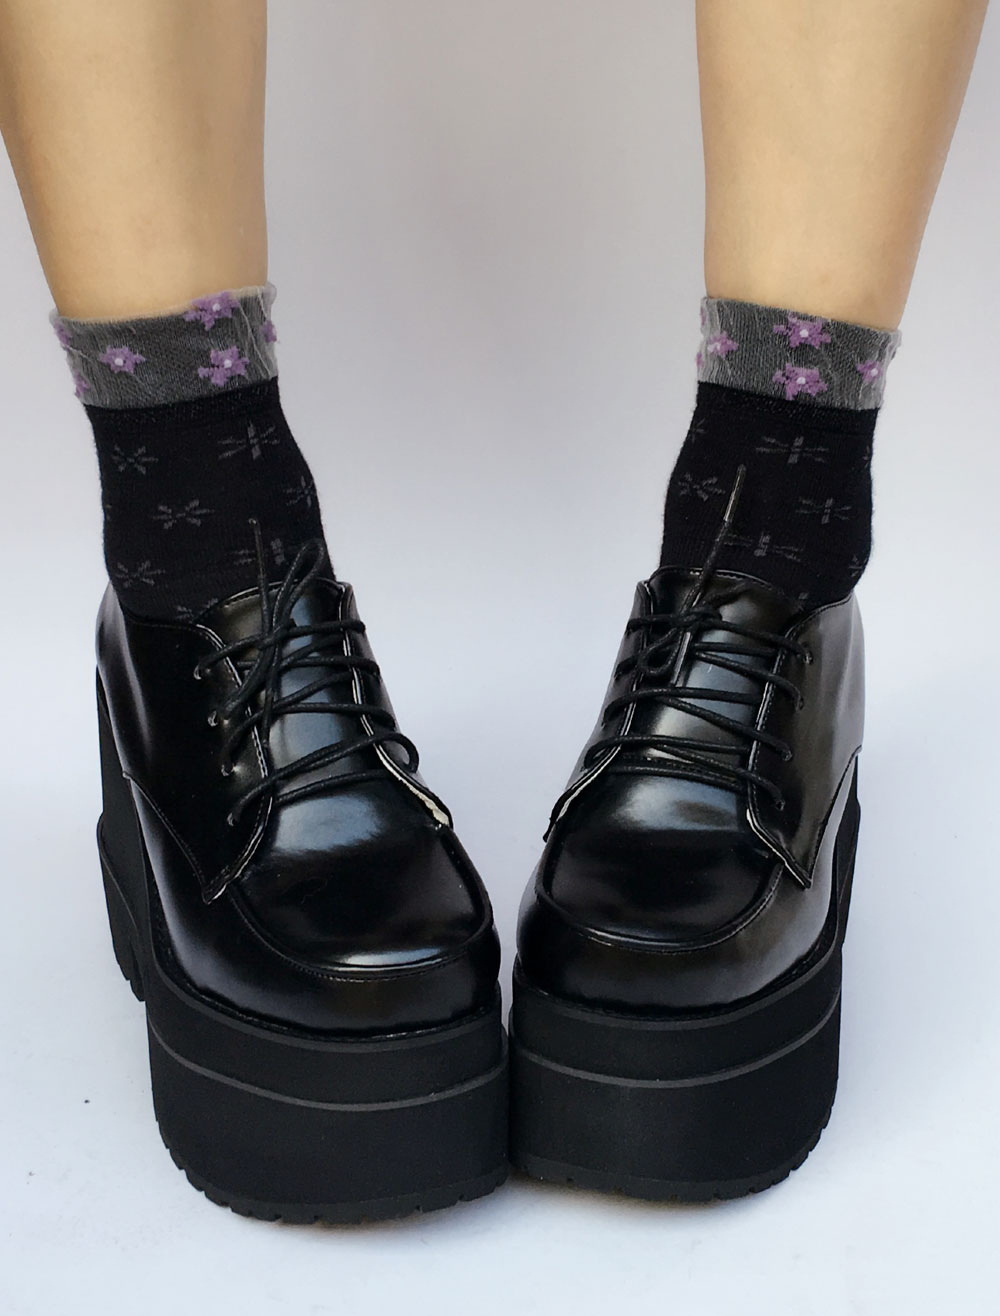 Lolita Platform Shoes Black Chunky Heel Square Toe Lace Up Lolita Pumps